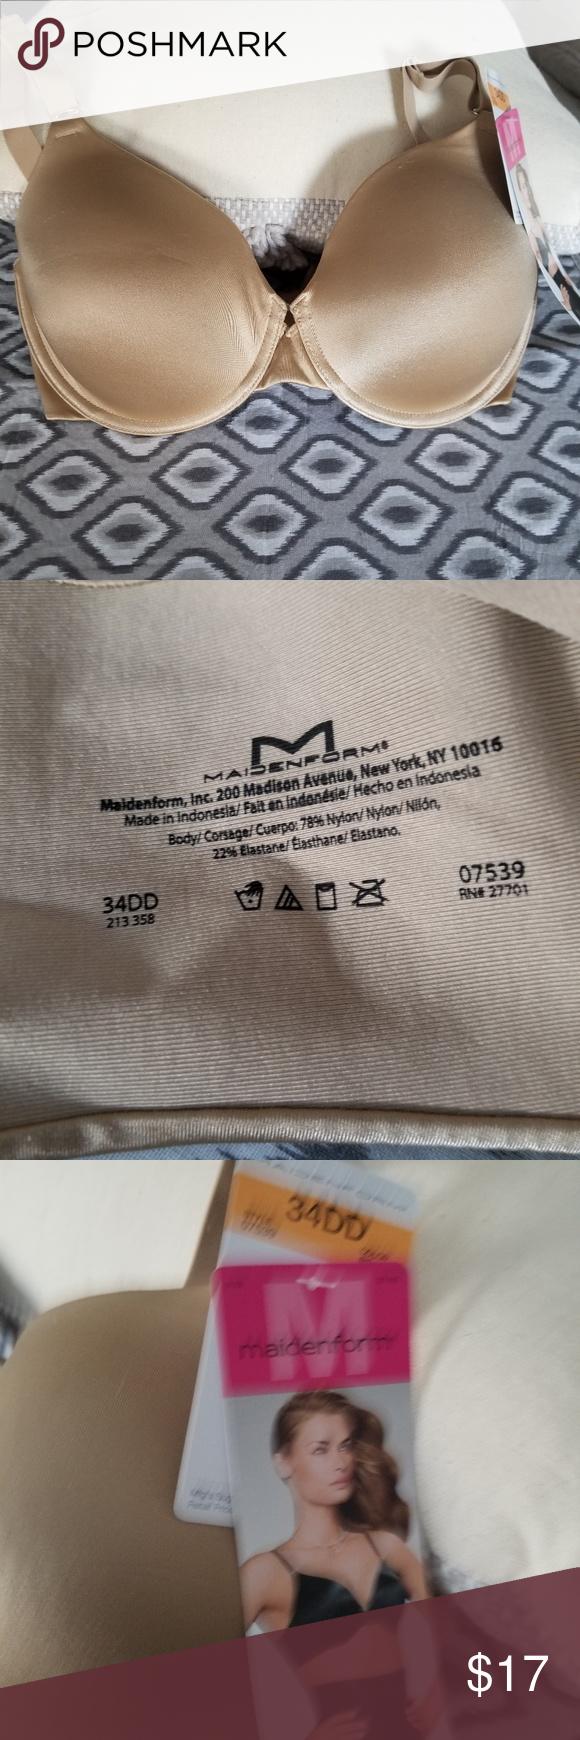 new jersey veterans memorial home jobs Bamboo Pillow Shredded Premium Memory Foam Pillow Adjustable